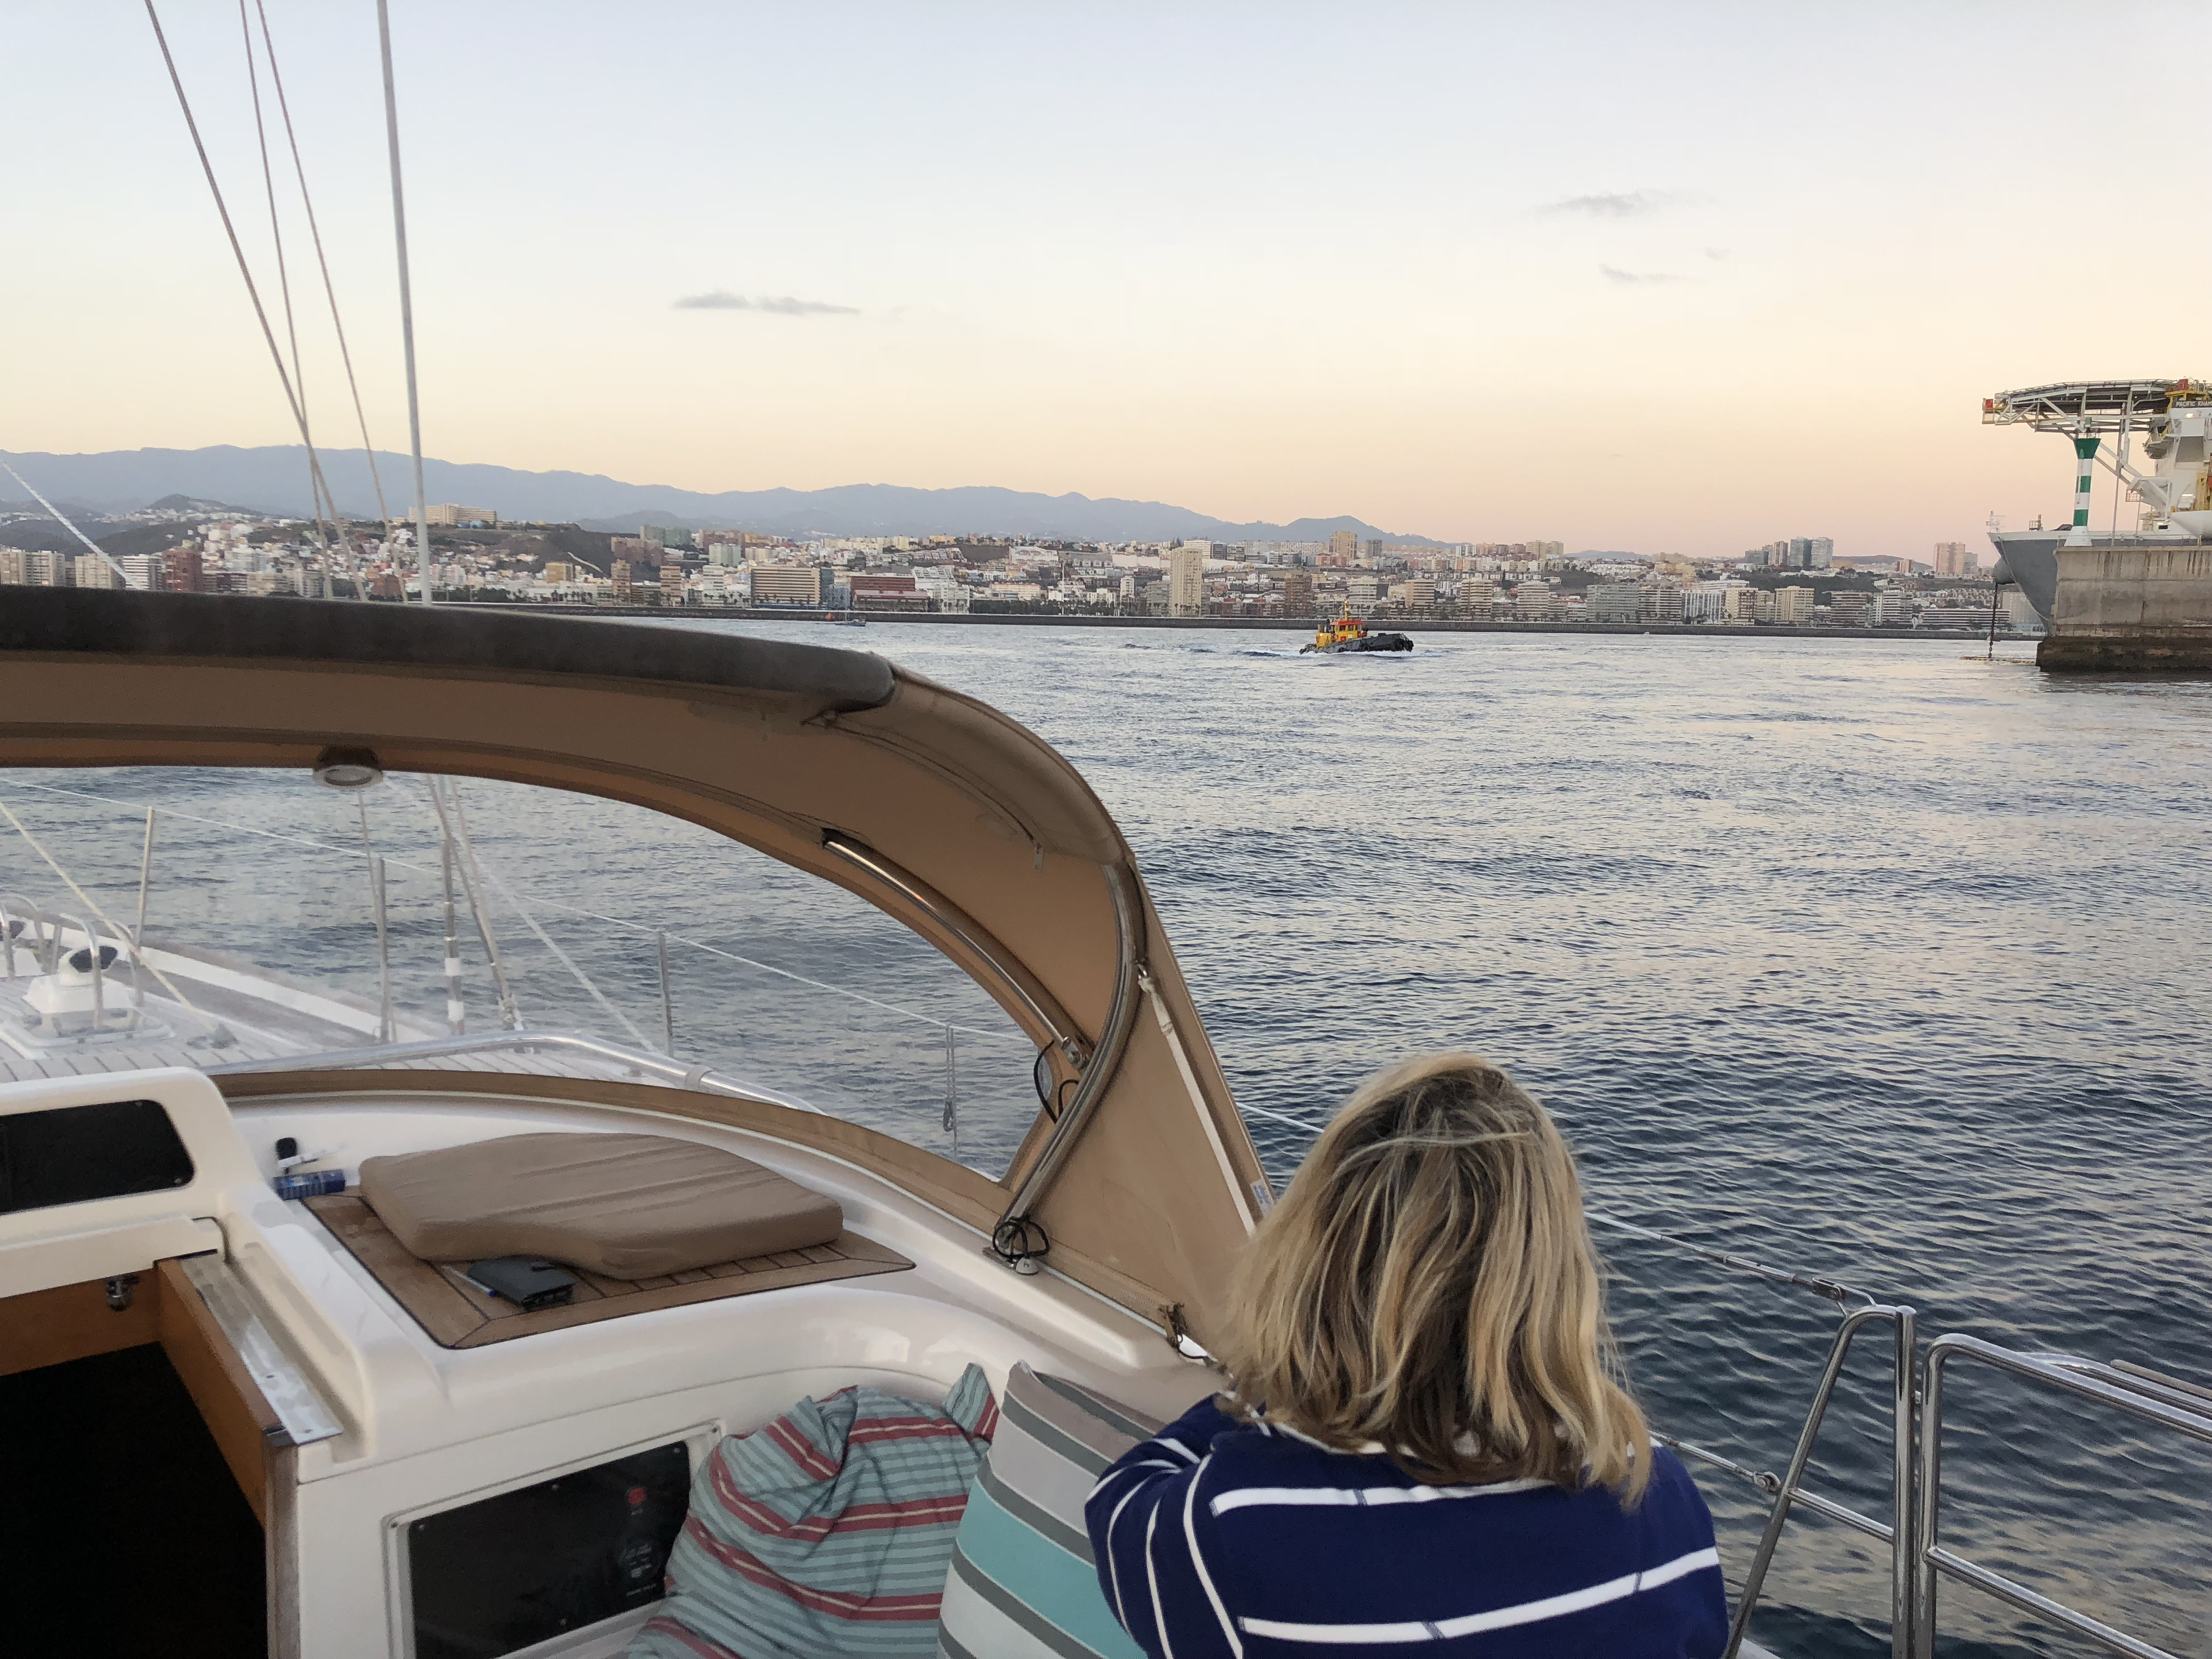 Entering the Marina Las Palmas